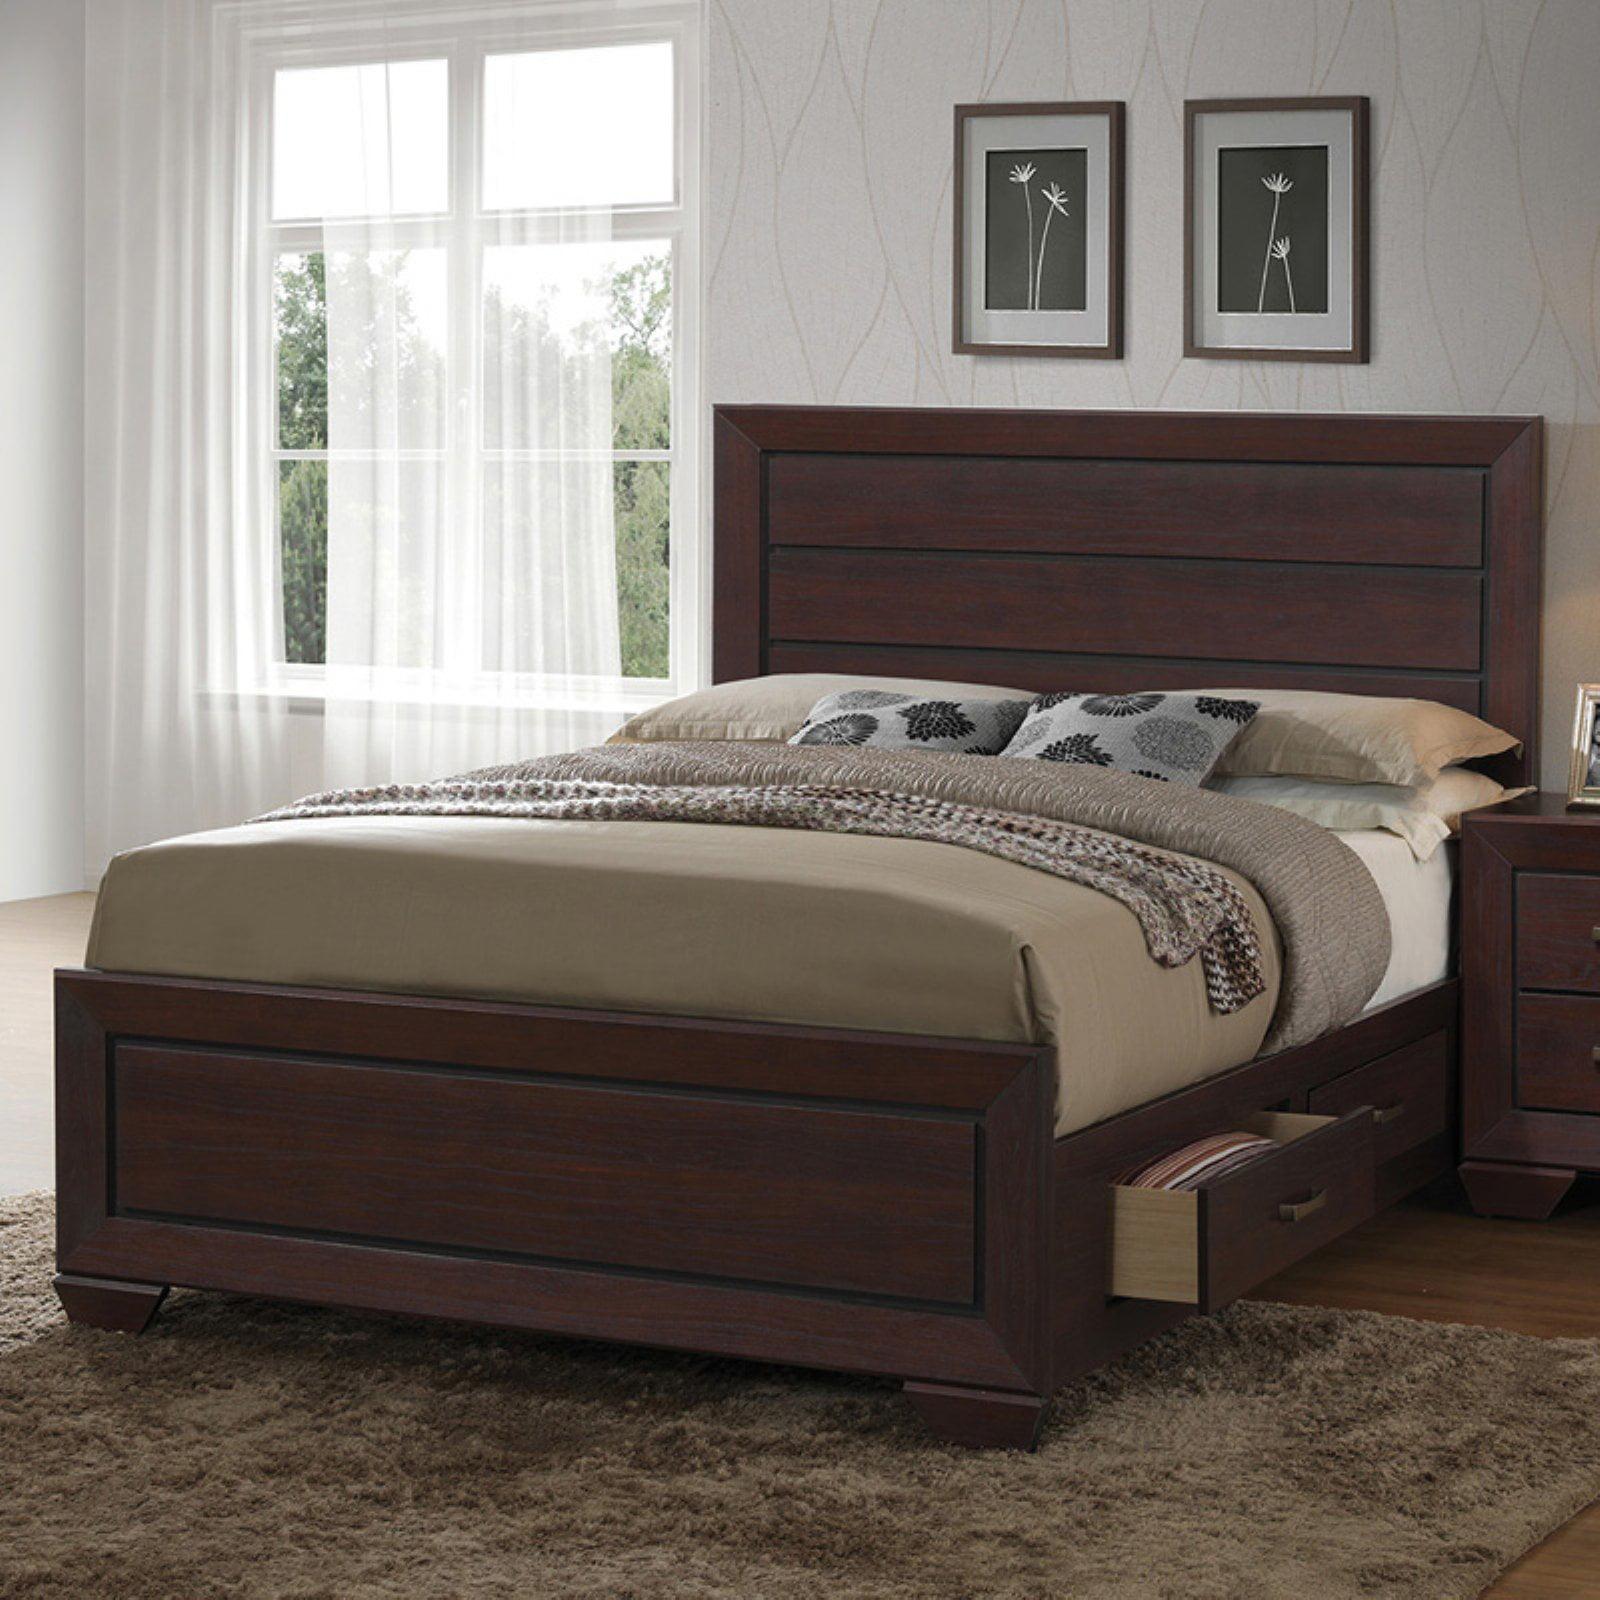 Coaster Furniture Fenbrook Panel Storage Bed